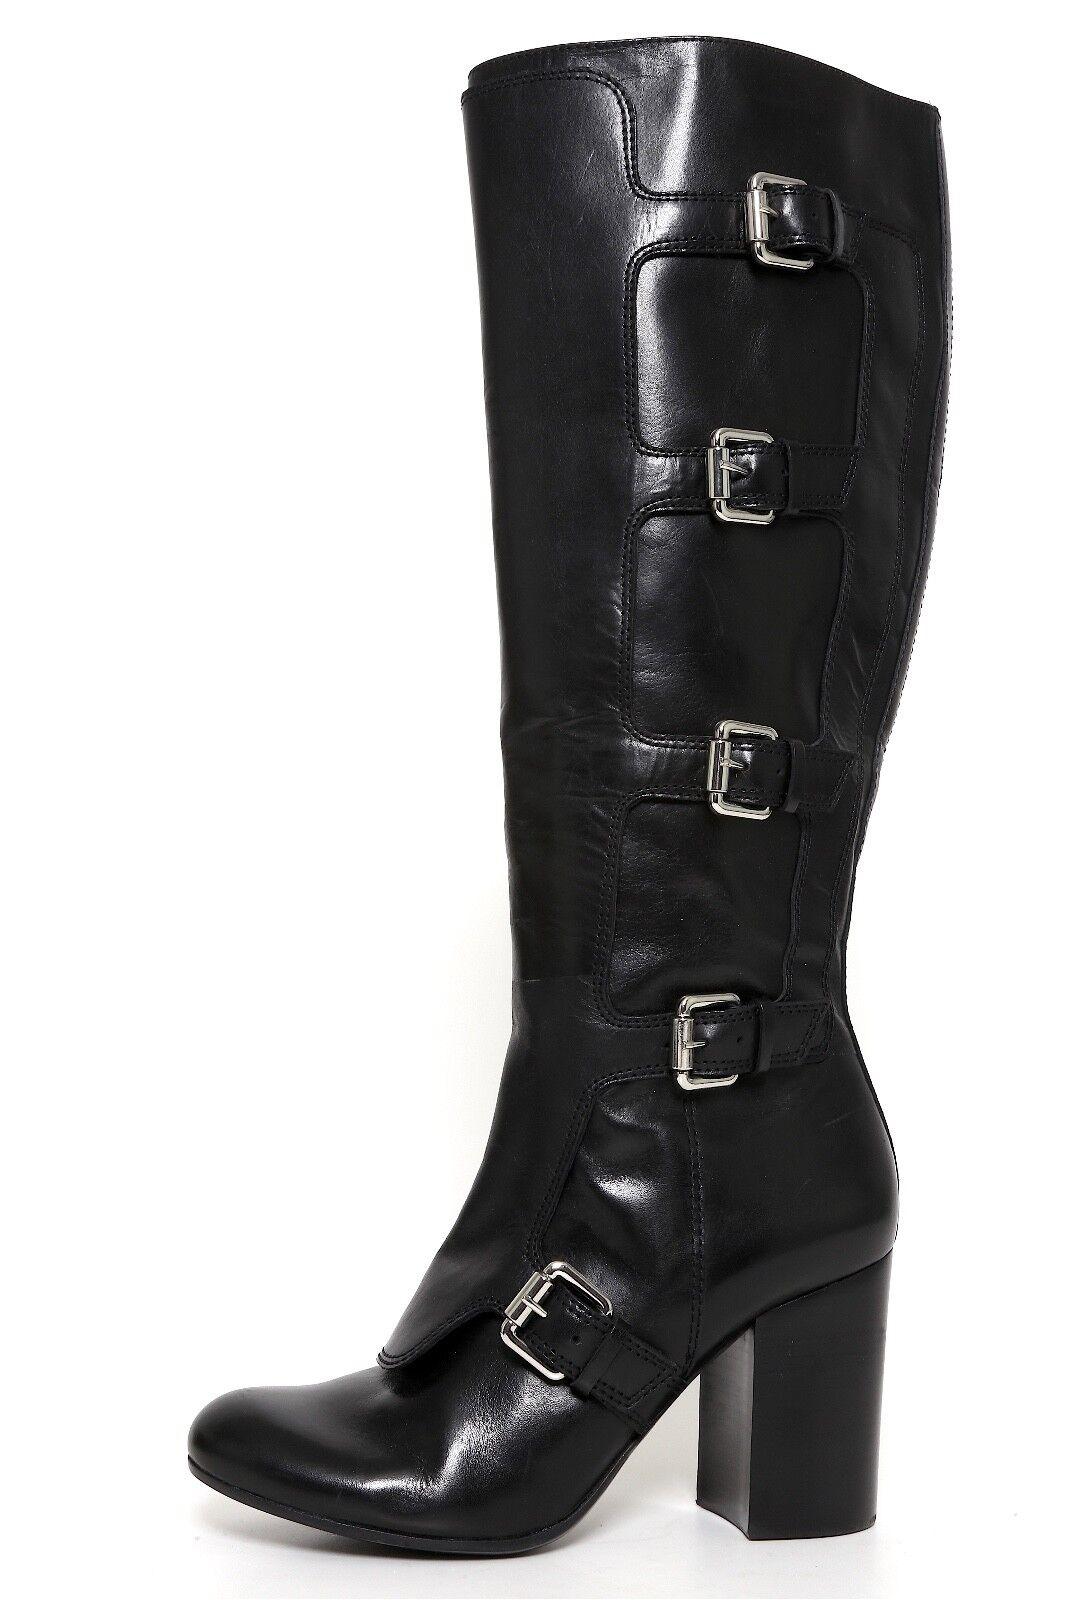 Vince Camuto Kyria Leather Buckle Boots Black Women Sz 8.5 M 6507